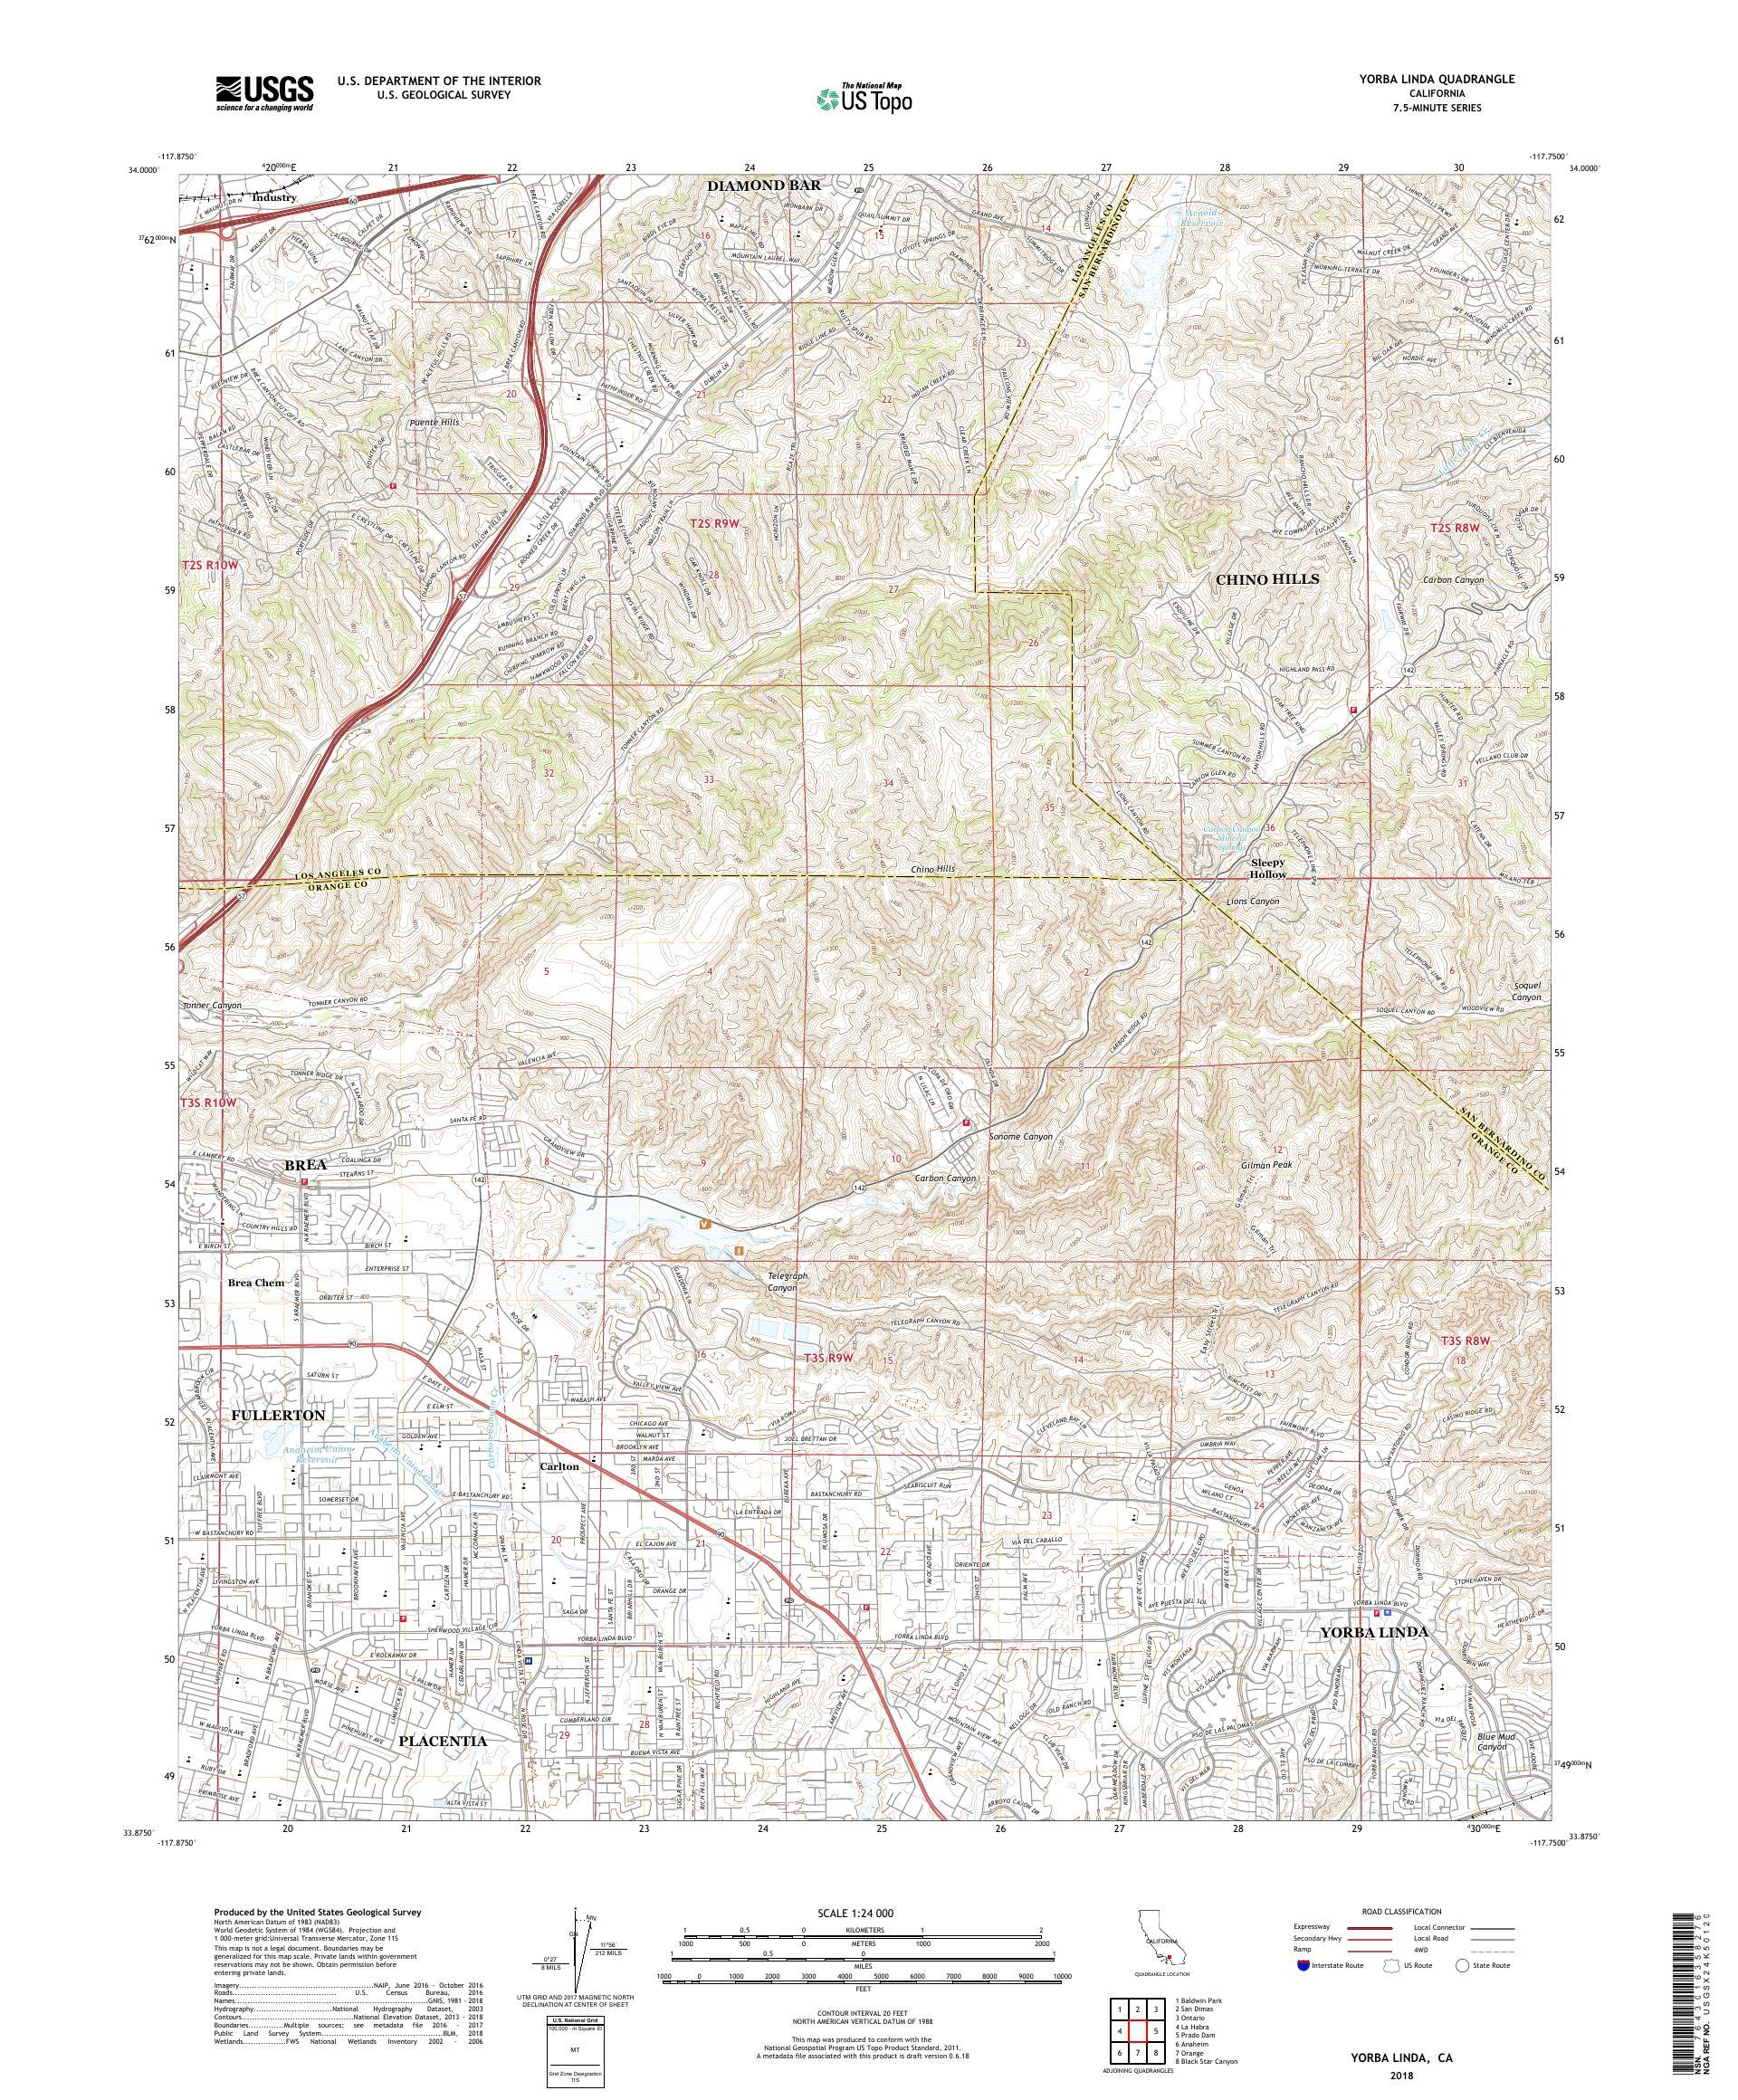 MyTopo Yorba Linda, California USGS Quad Topo Map on claremont map, madison heights map, kalamazoo map, downey map, gresham map, south los angeles map, whittier blvd map, san lorenzo map, linda cal map, los alamitos map, woodland map, elberton map, sherman oaks map, covington map, placentia map, san dimas map, santa ysabel map, ione map, linda ca map, oak view map,